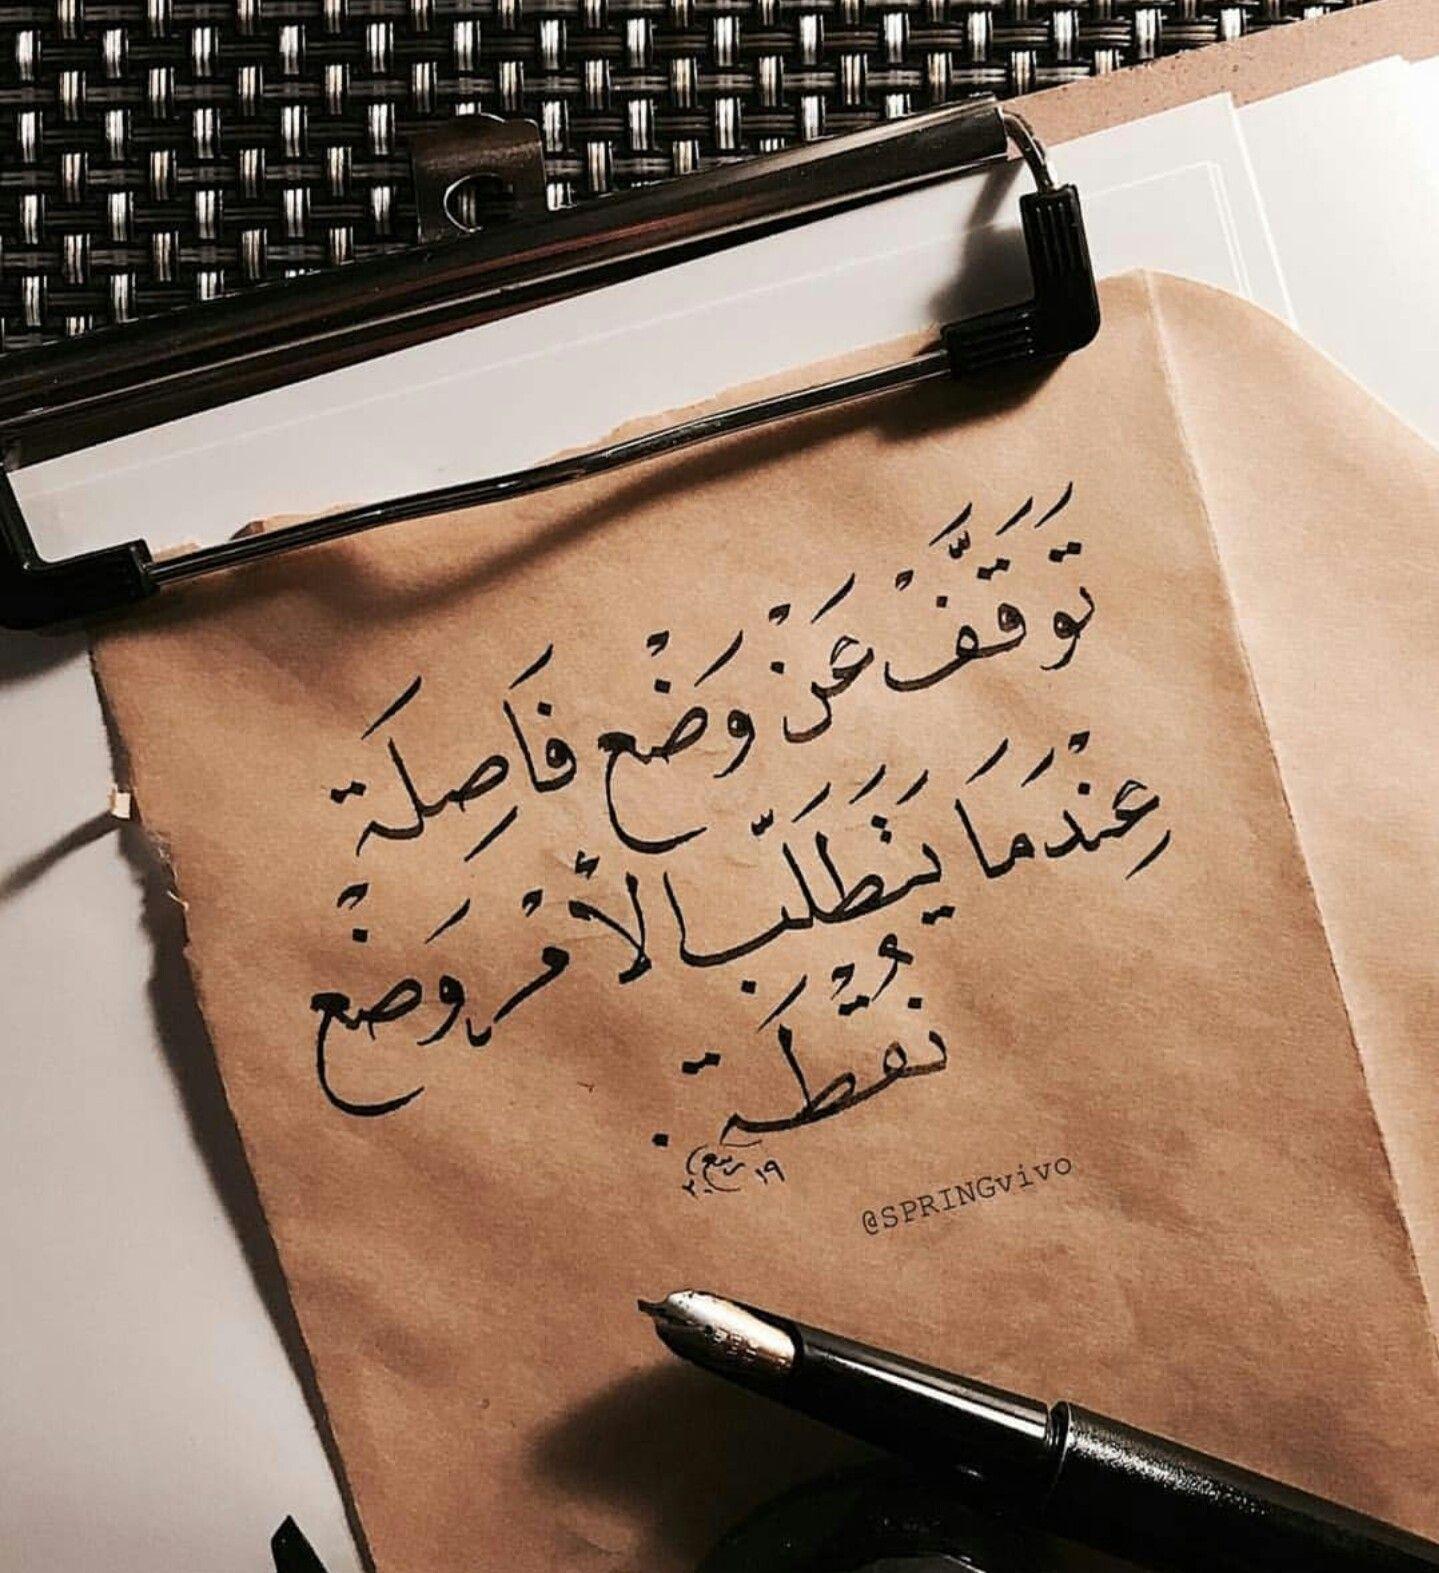 هل وضعت فاصله ام نقطه ام ثلاث نقاط لا اعرف Pen And Paper Galaxy Wallpaper Islamic Pictures